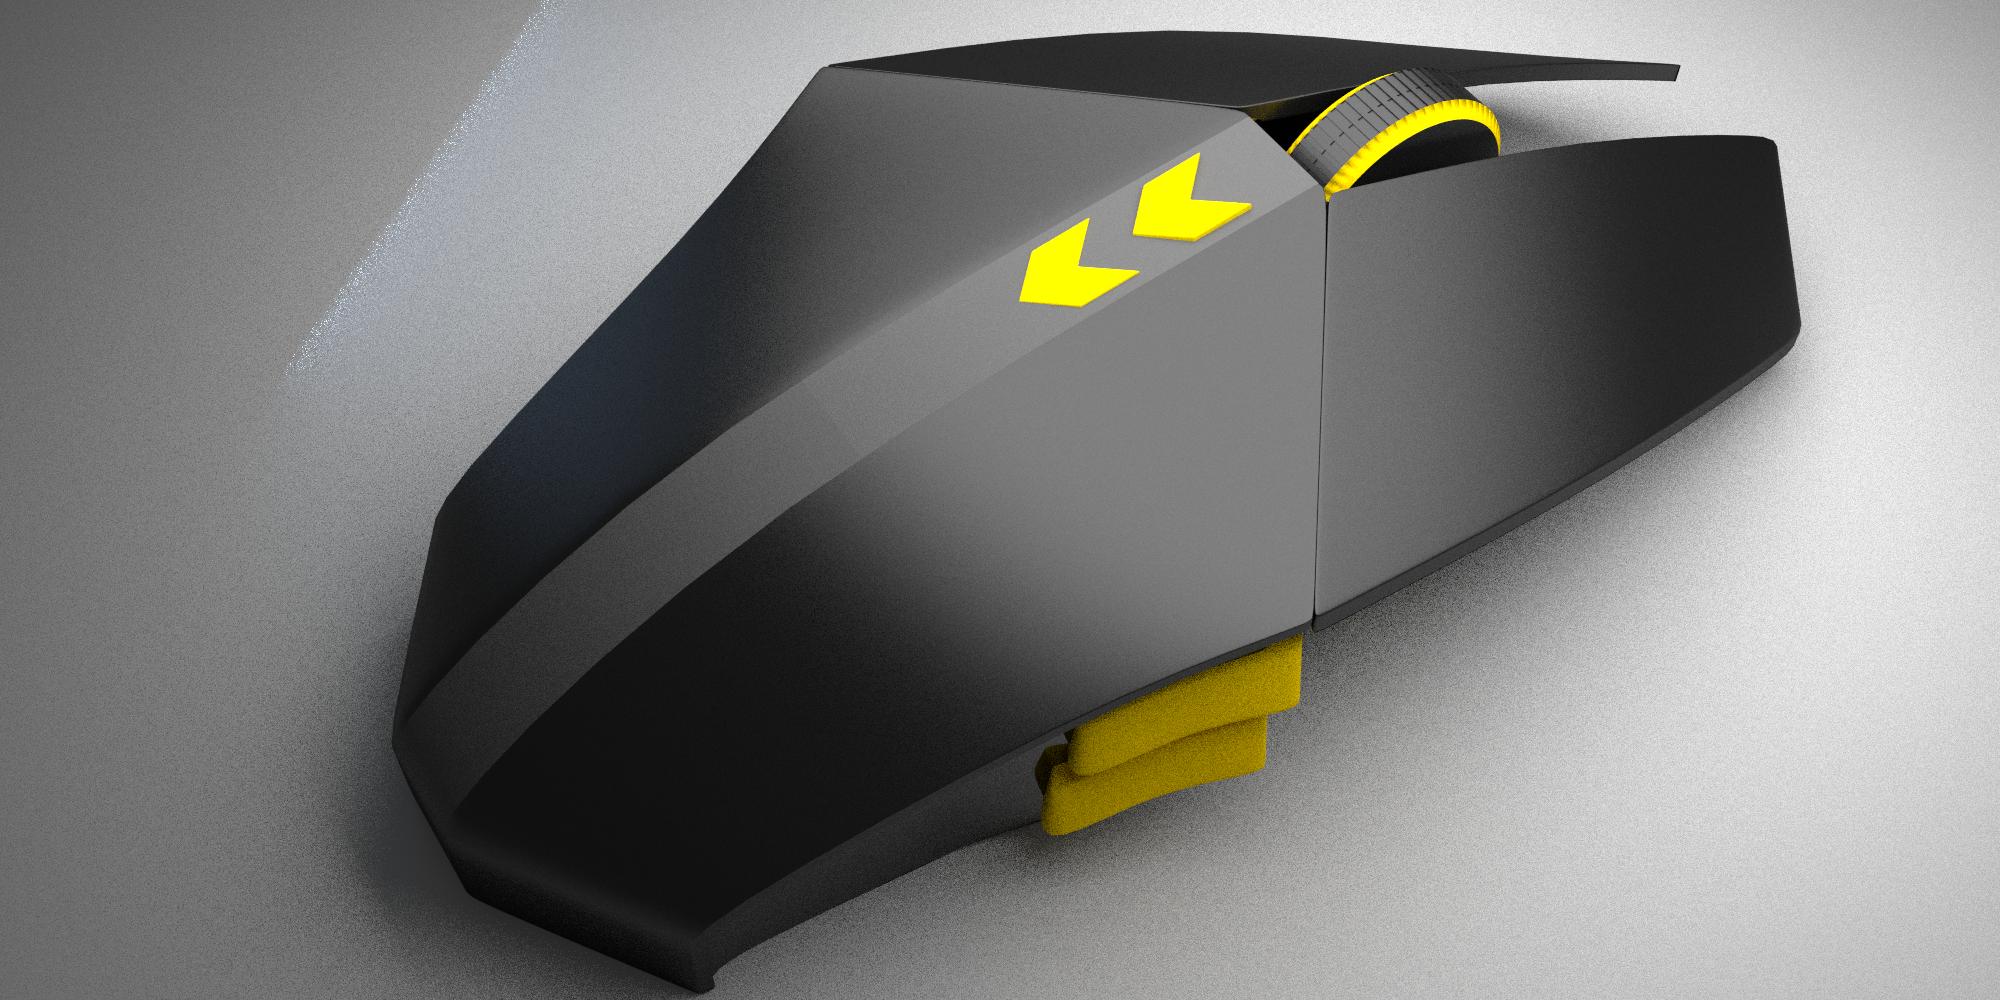 Dpfr futuristic computer mouse 3d model obj blend for Futuristic household items